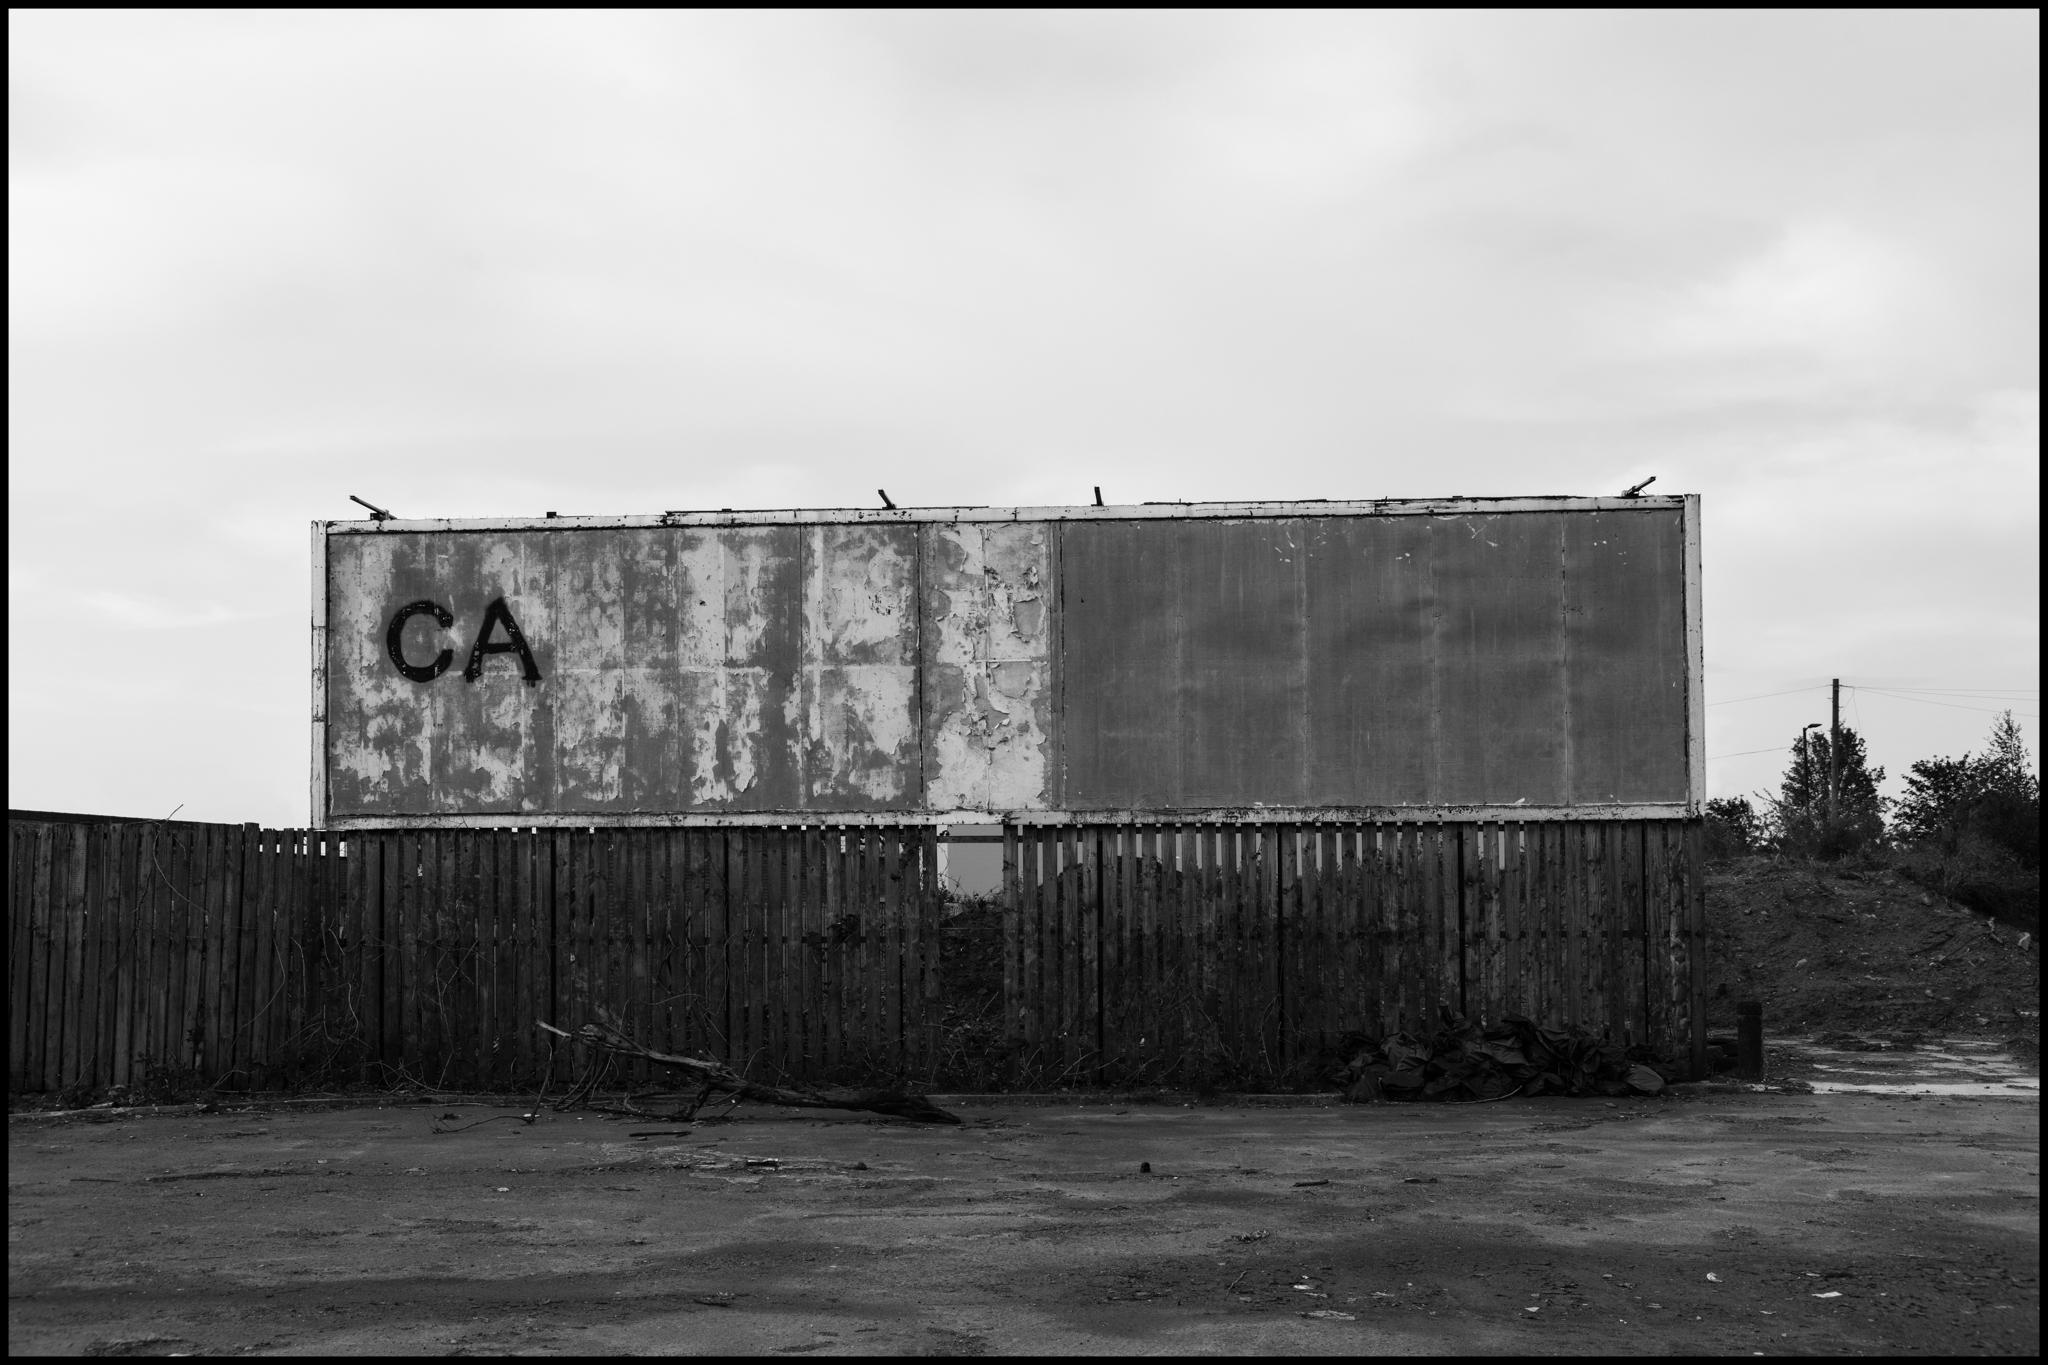 25 April 2019 - CA billboard, Manchester UK